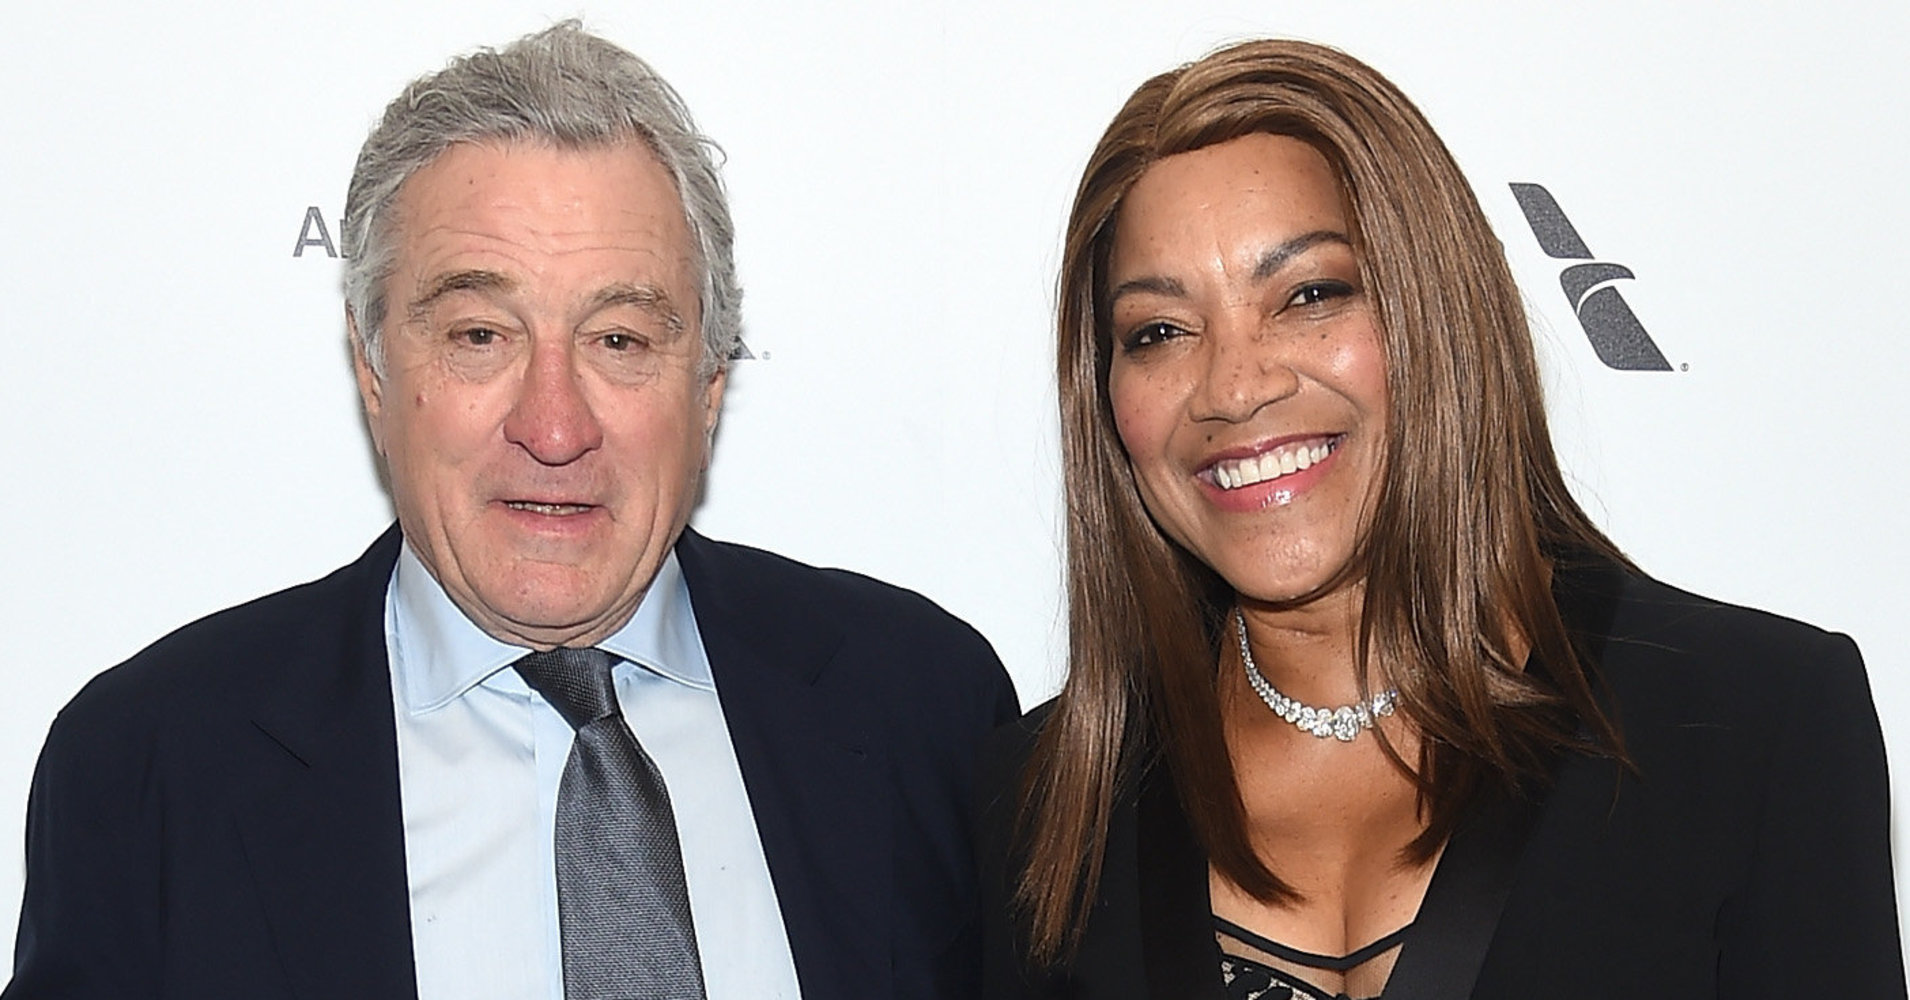 Robert De Niro Breaks Silence